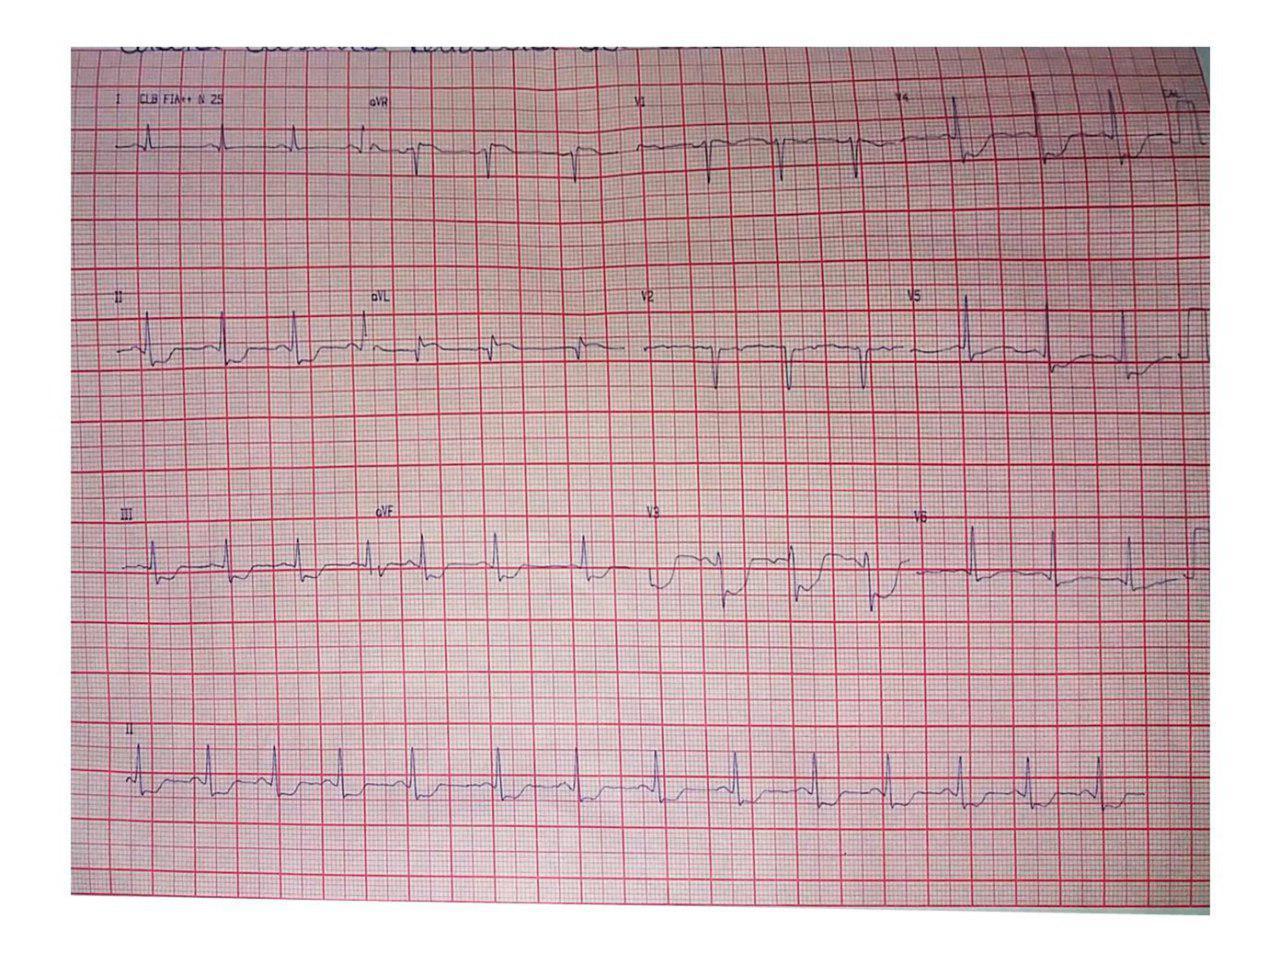 Femenina de 25 años con dolor anginoso prolongado. Disección espontánea de arteria DA